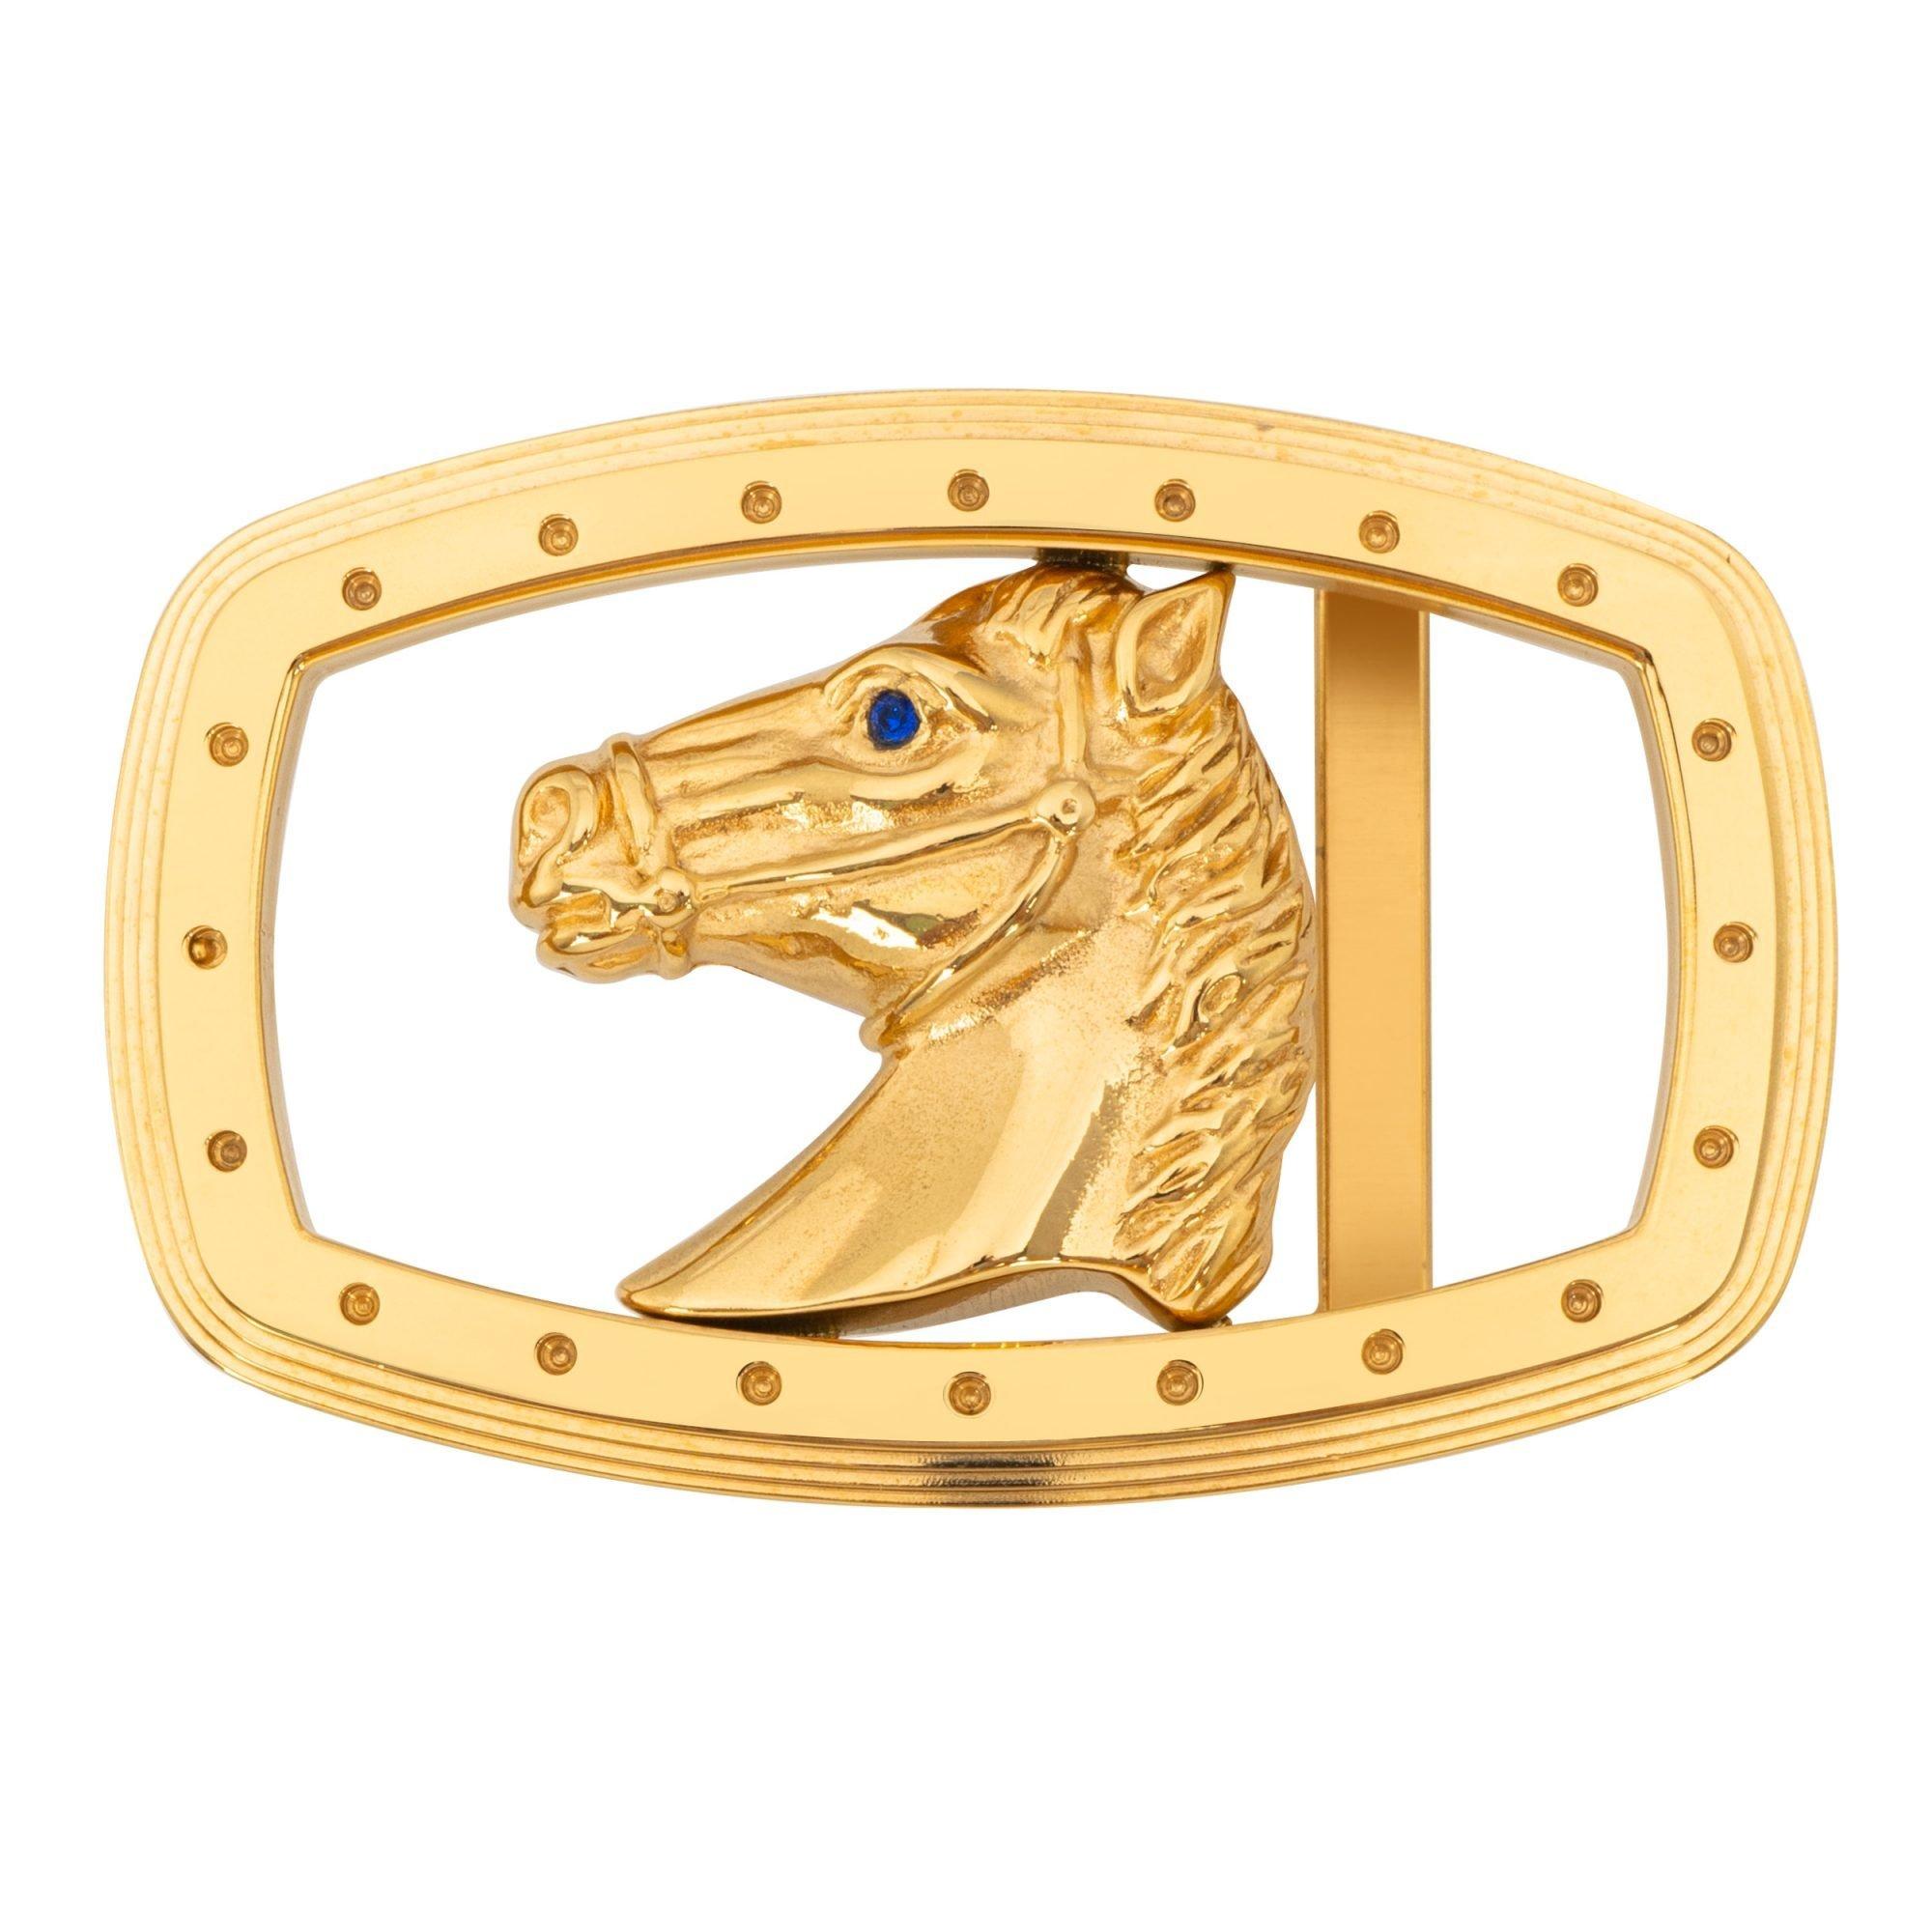 VIKTOR ALEXANDER 38MM STAINLESS STEEL HORSE BLUE SPINEL GEMSTONE BUCKLE